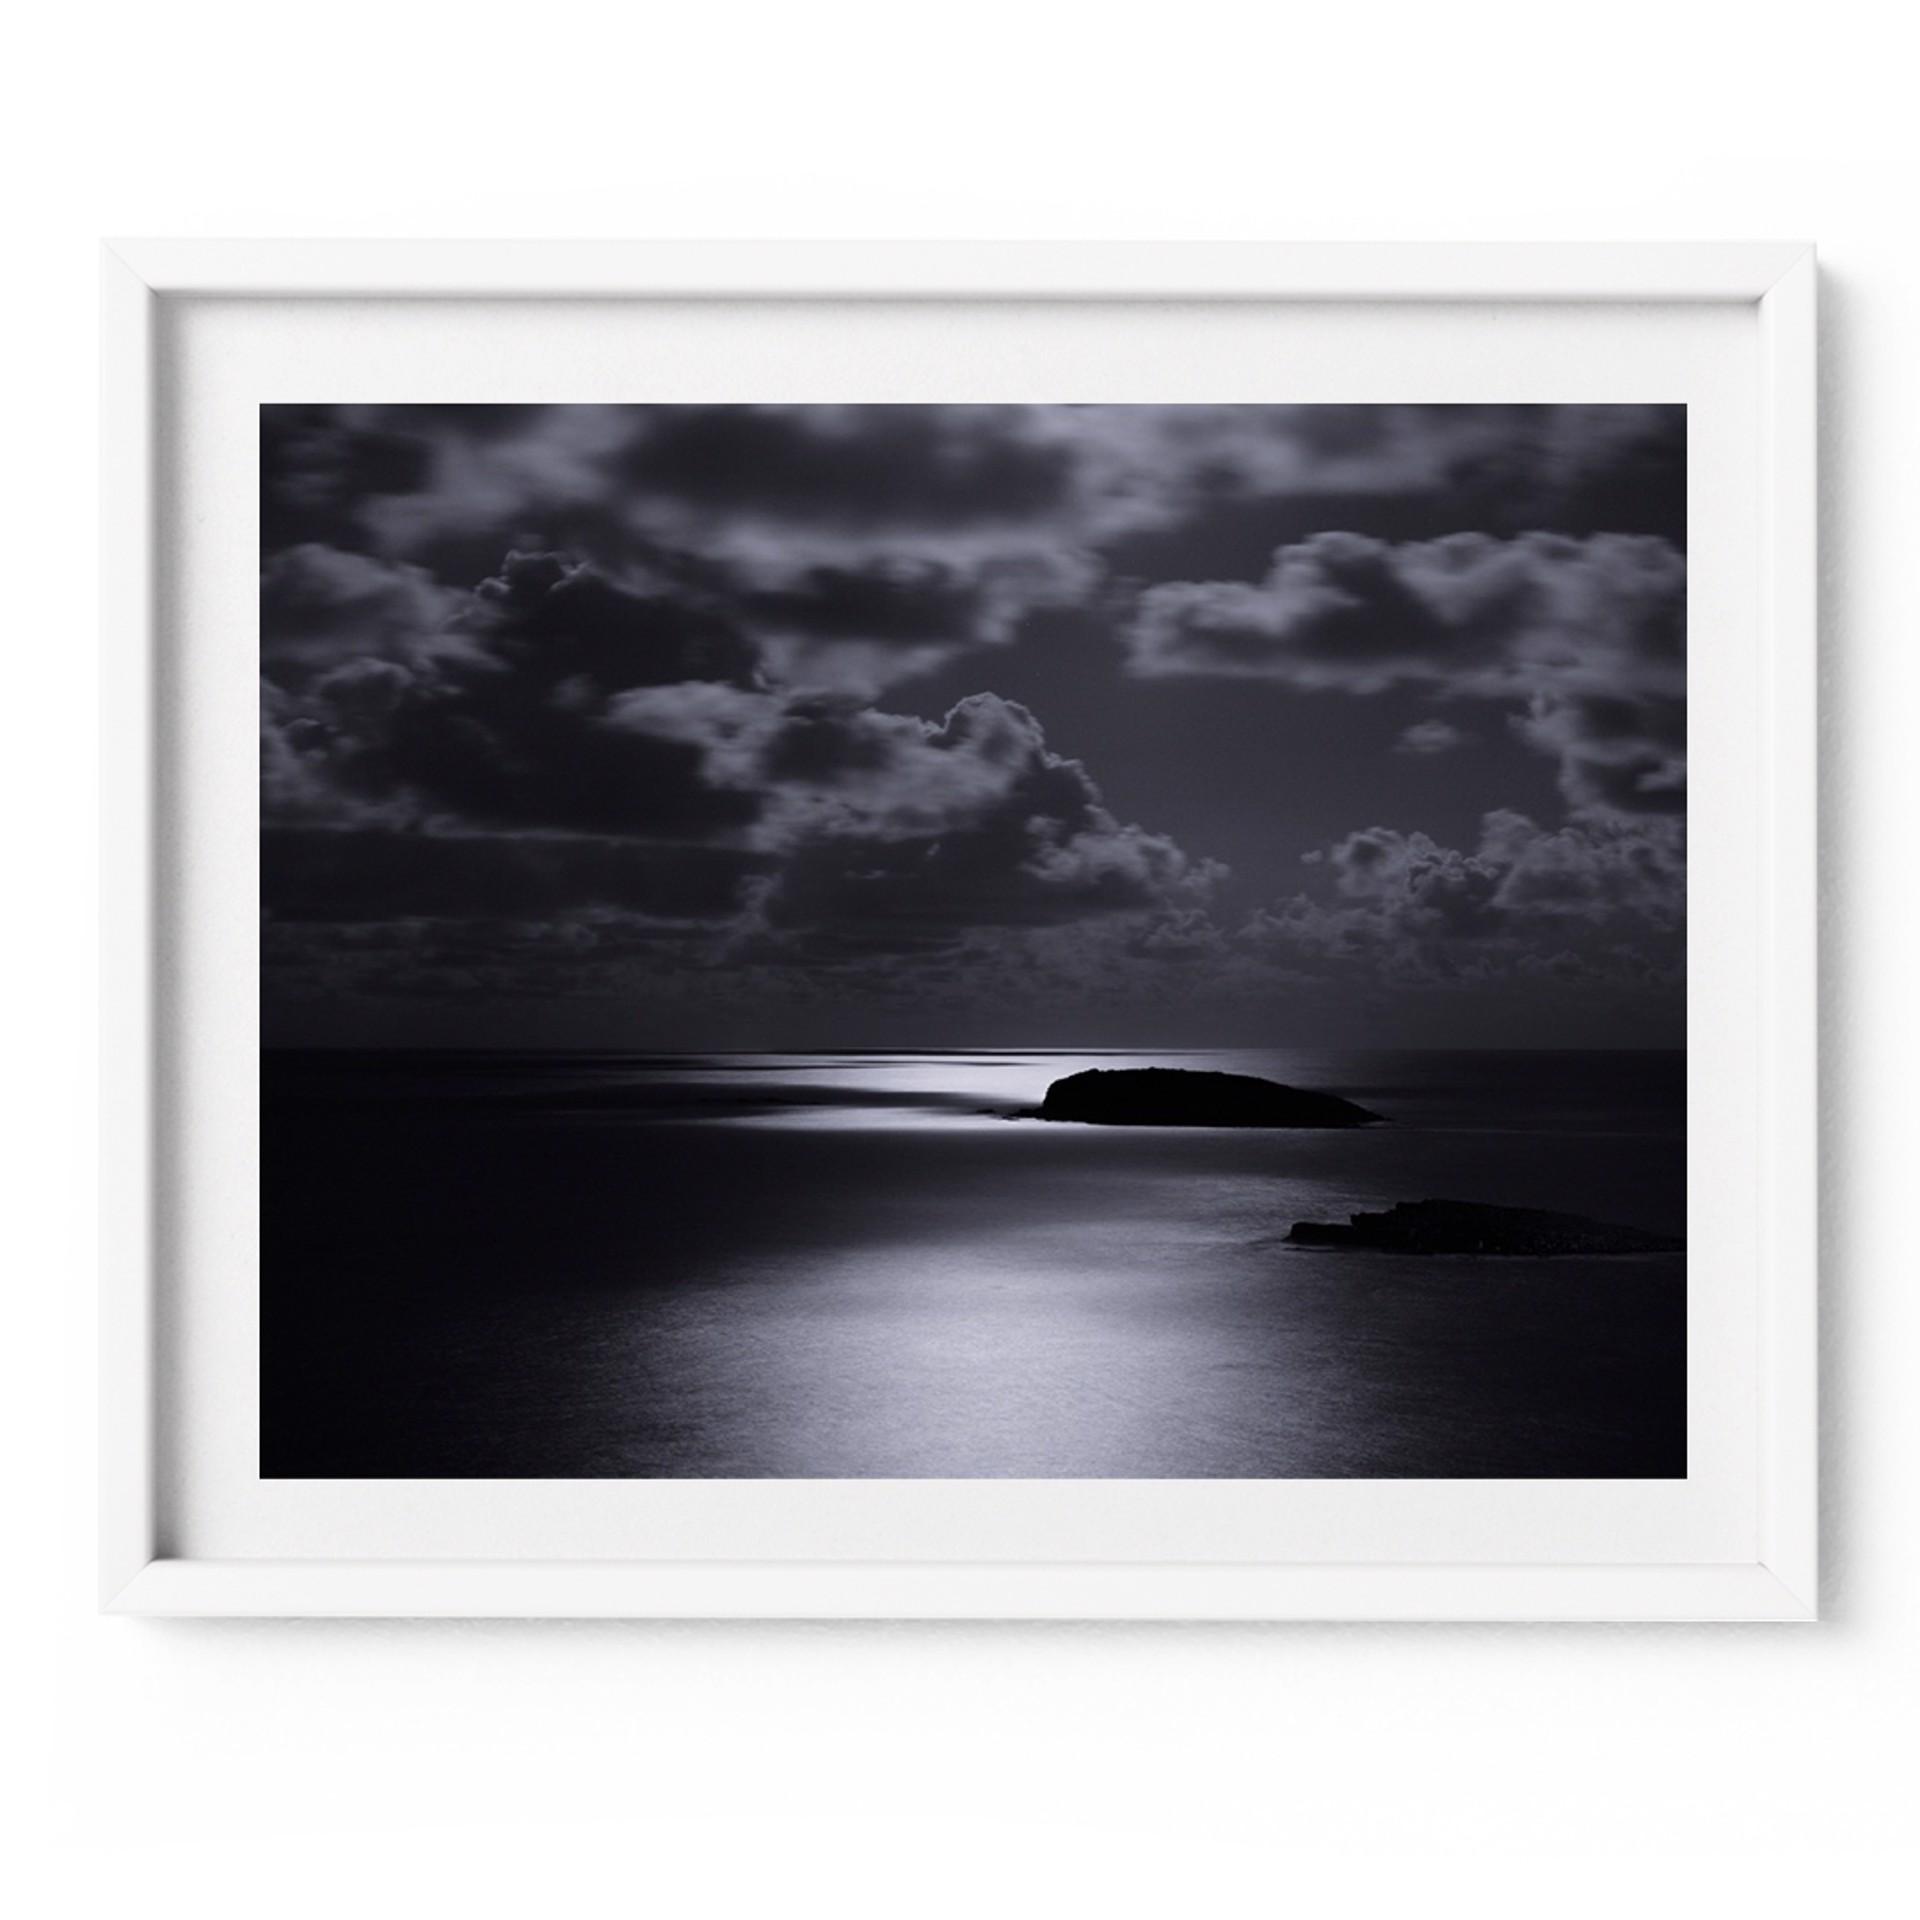 Moonscape #7 by Gabriella Imperatori-Penn